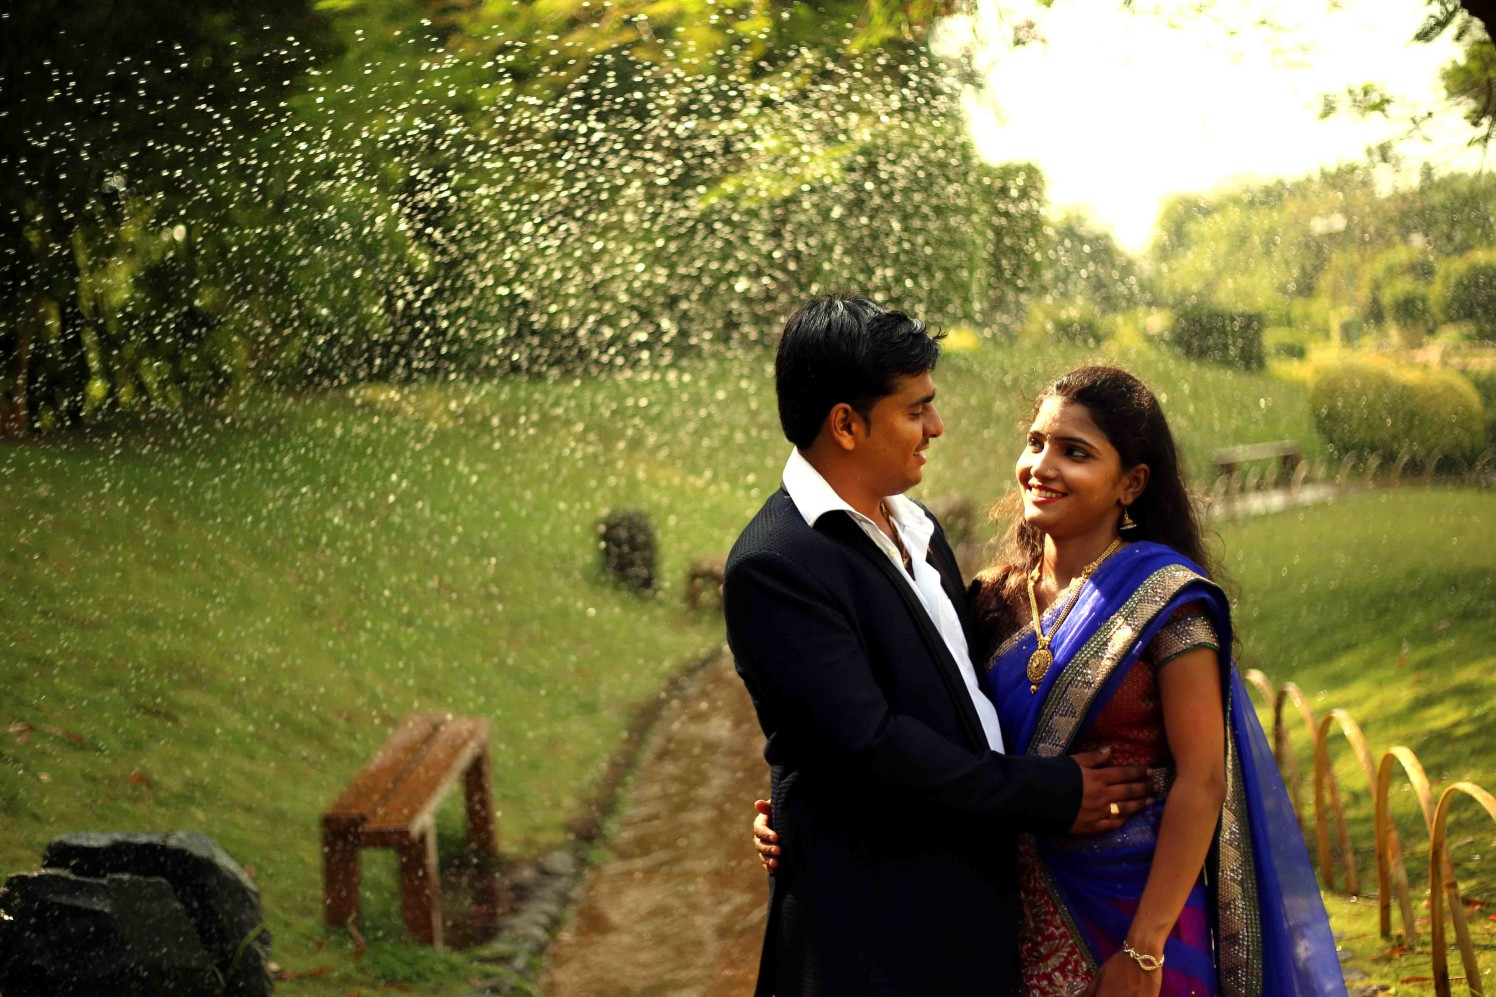 Bobby dazzler duology by Rushil Jadhav Wedding-photography | Weddings Photos & Ideas